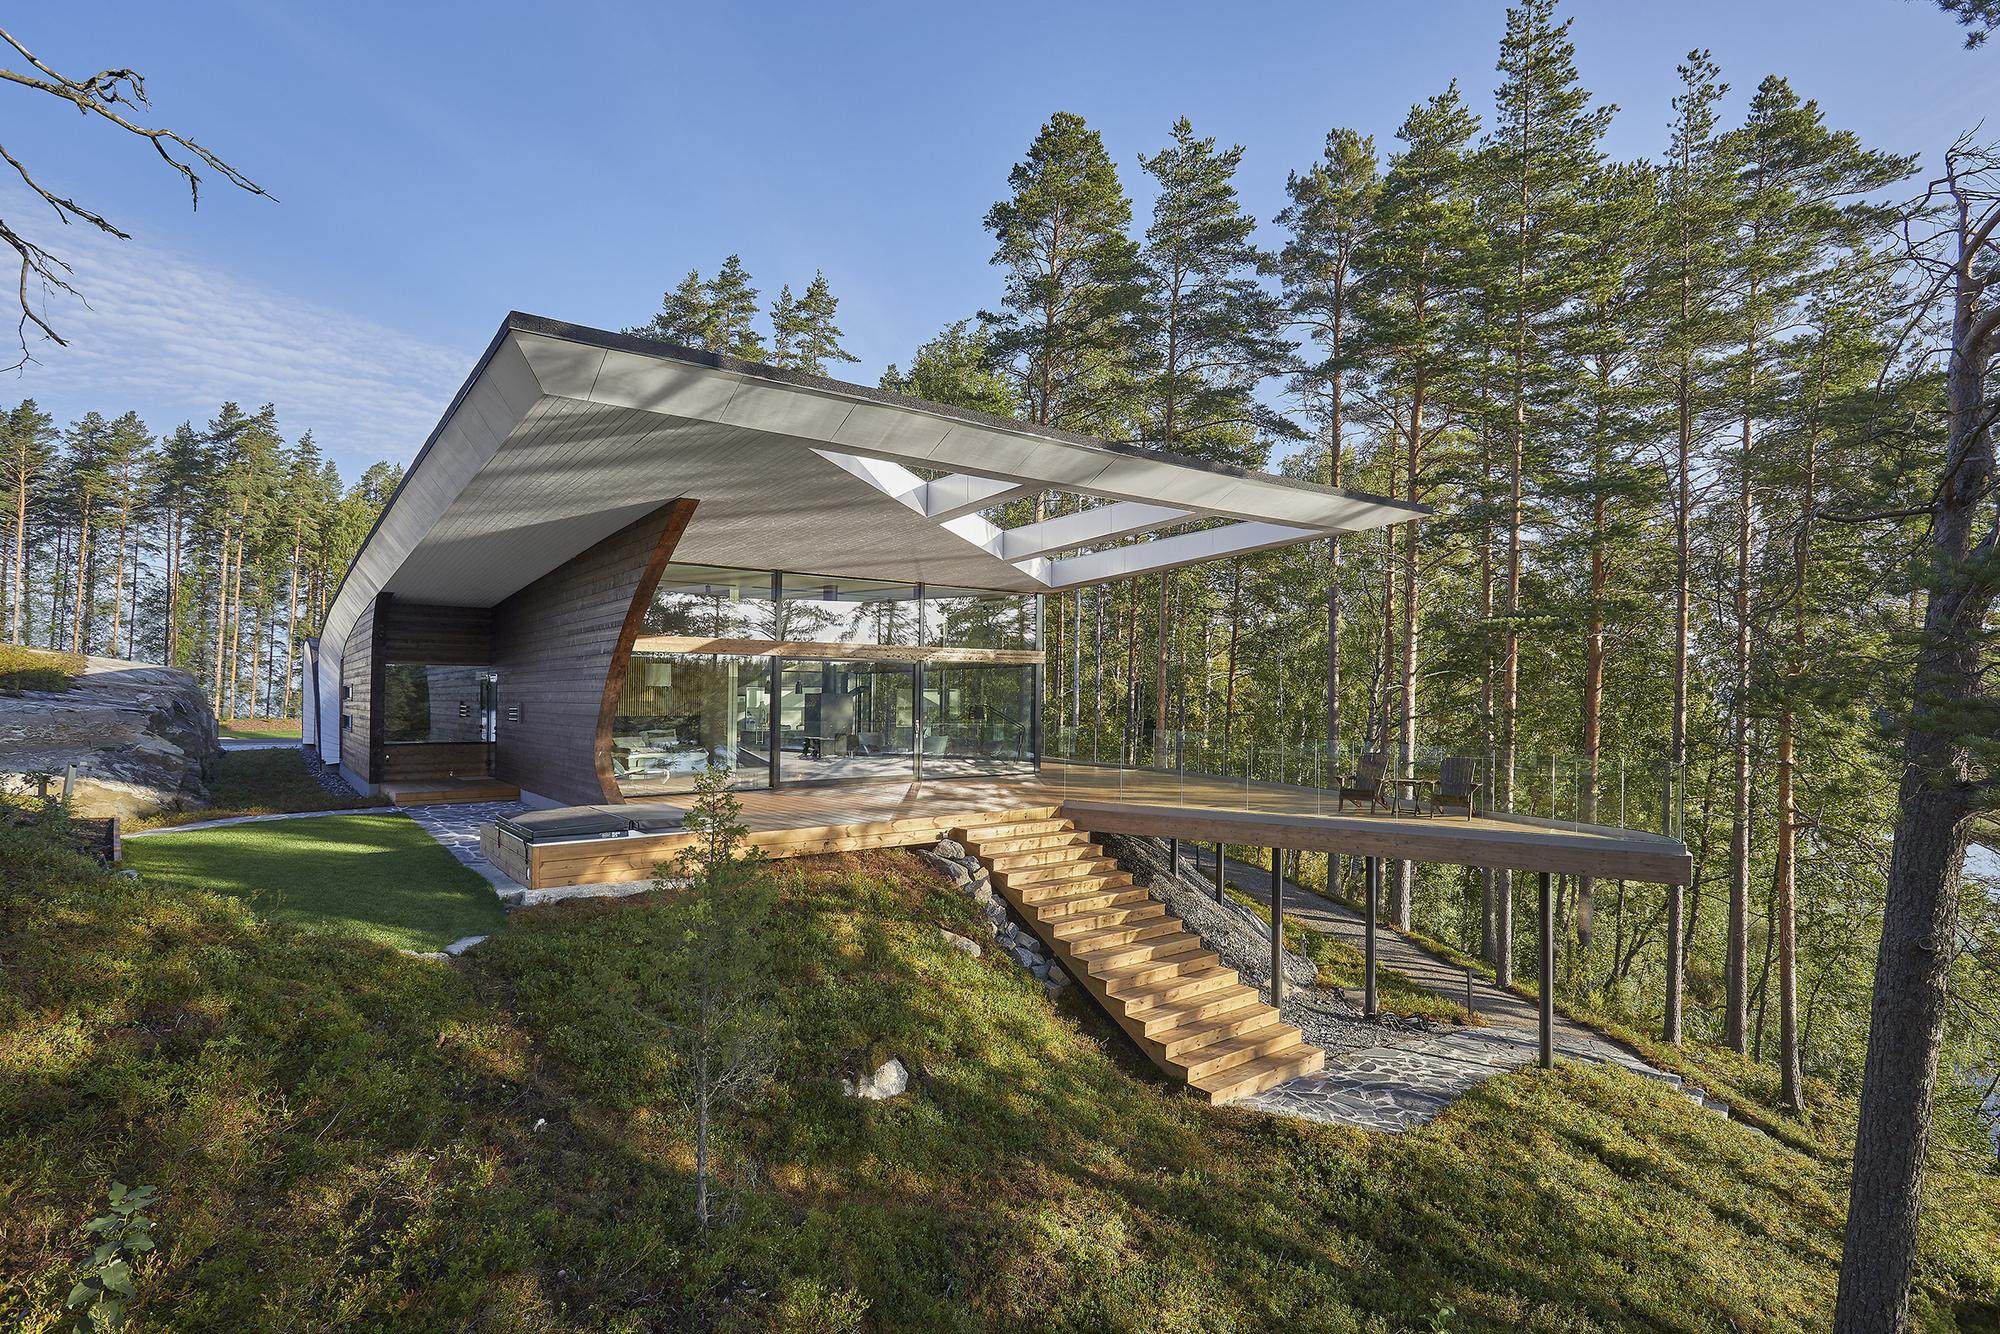 Wave House / Seppo Mäntylä, Finland, 2017 [2,000px × 1,334px]